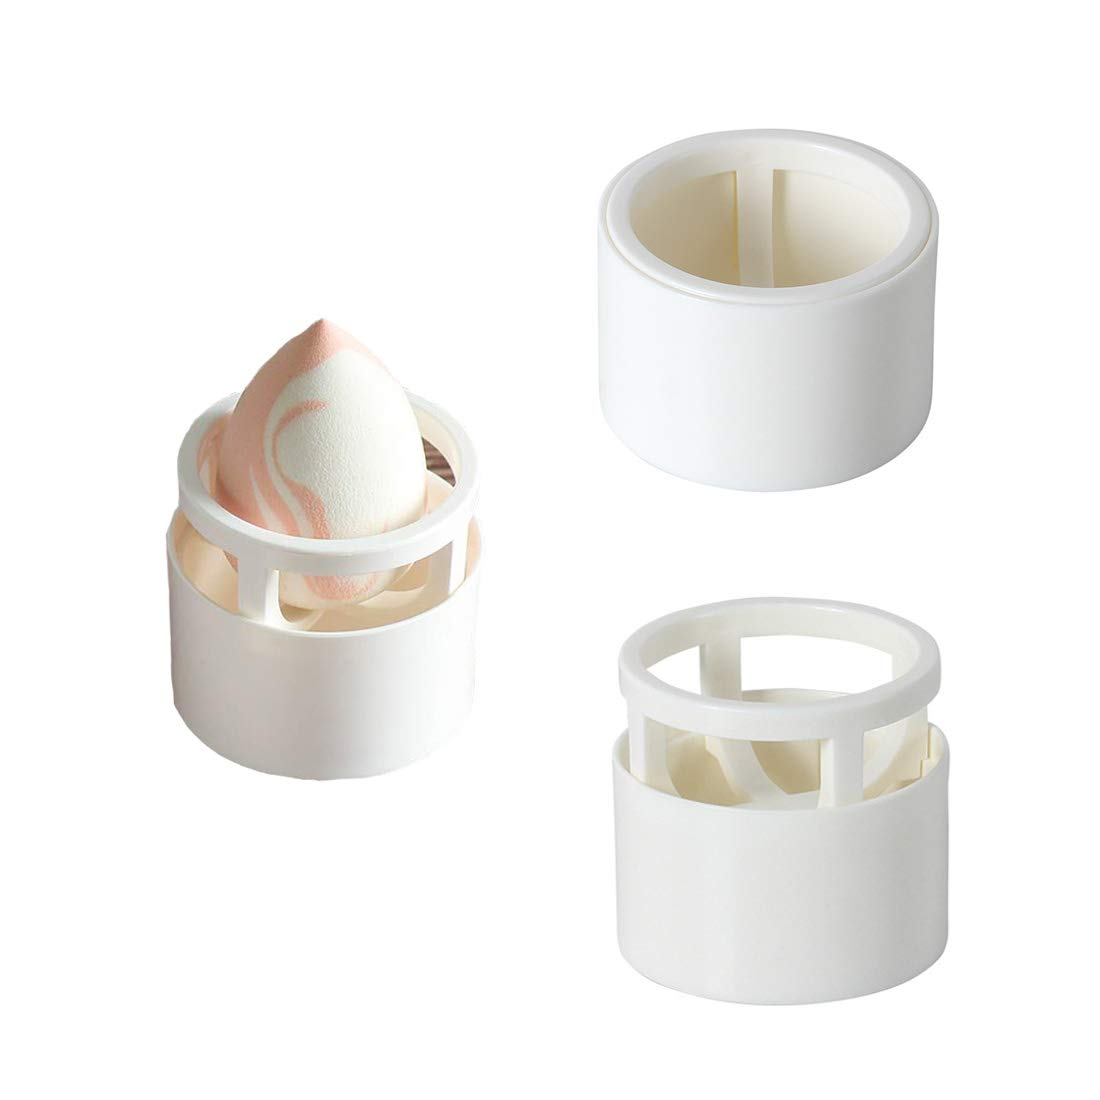 GBSTORE Beauty Sponge Blender Holders,Makeup Sponge Holder Drying Rack Egg Powder Puff Display Stand,hasThree different display way(Milky White)